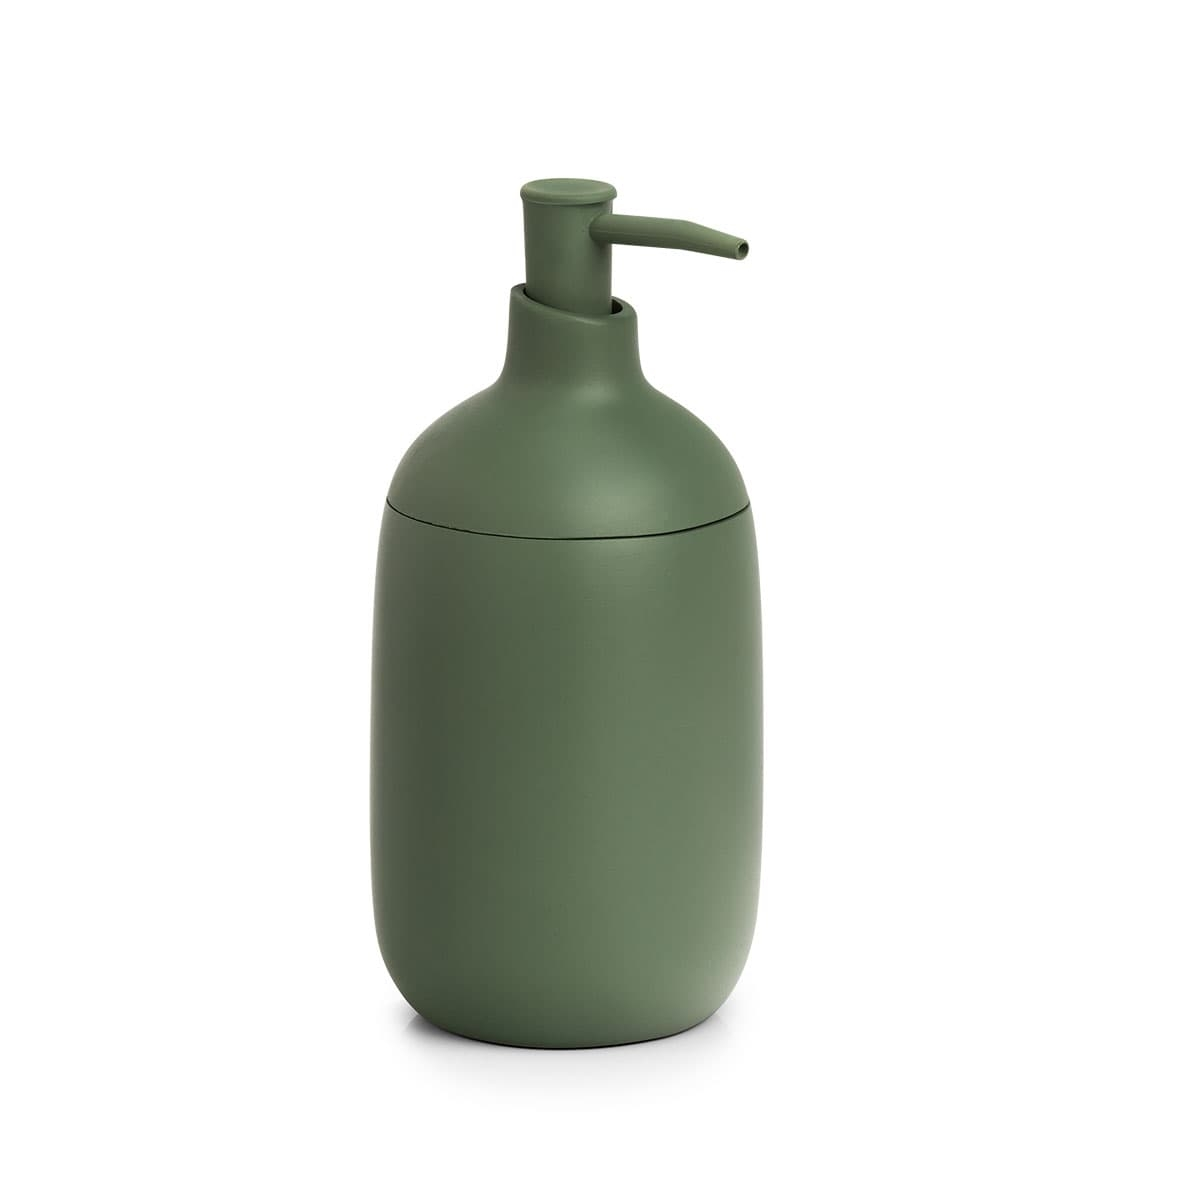 Dozator pentru sapun din polirasina, Sage Verde Inchis, Ø7,2xH16 cm imagine